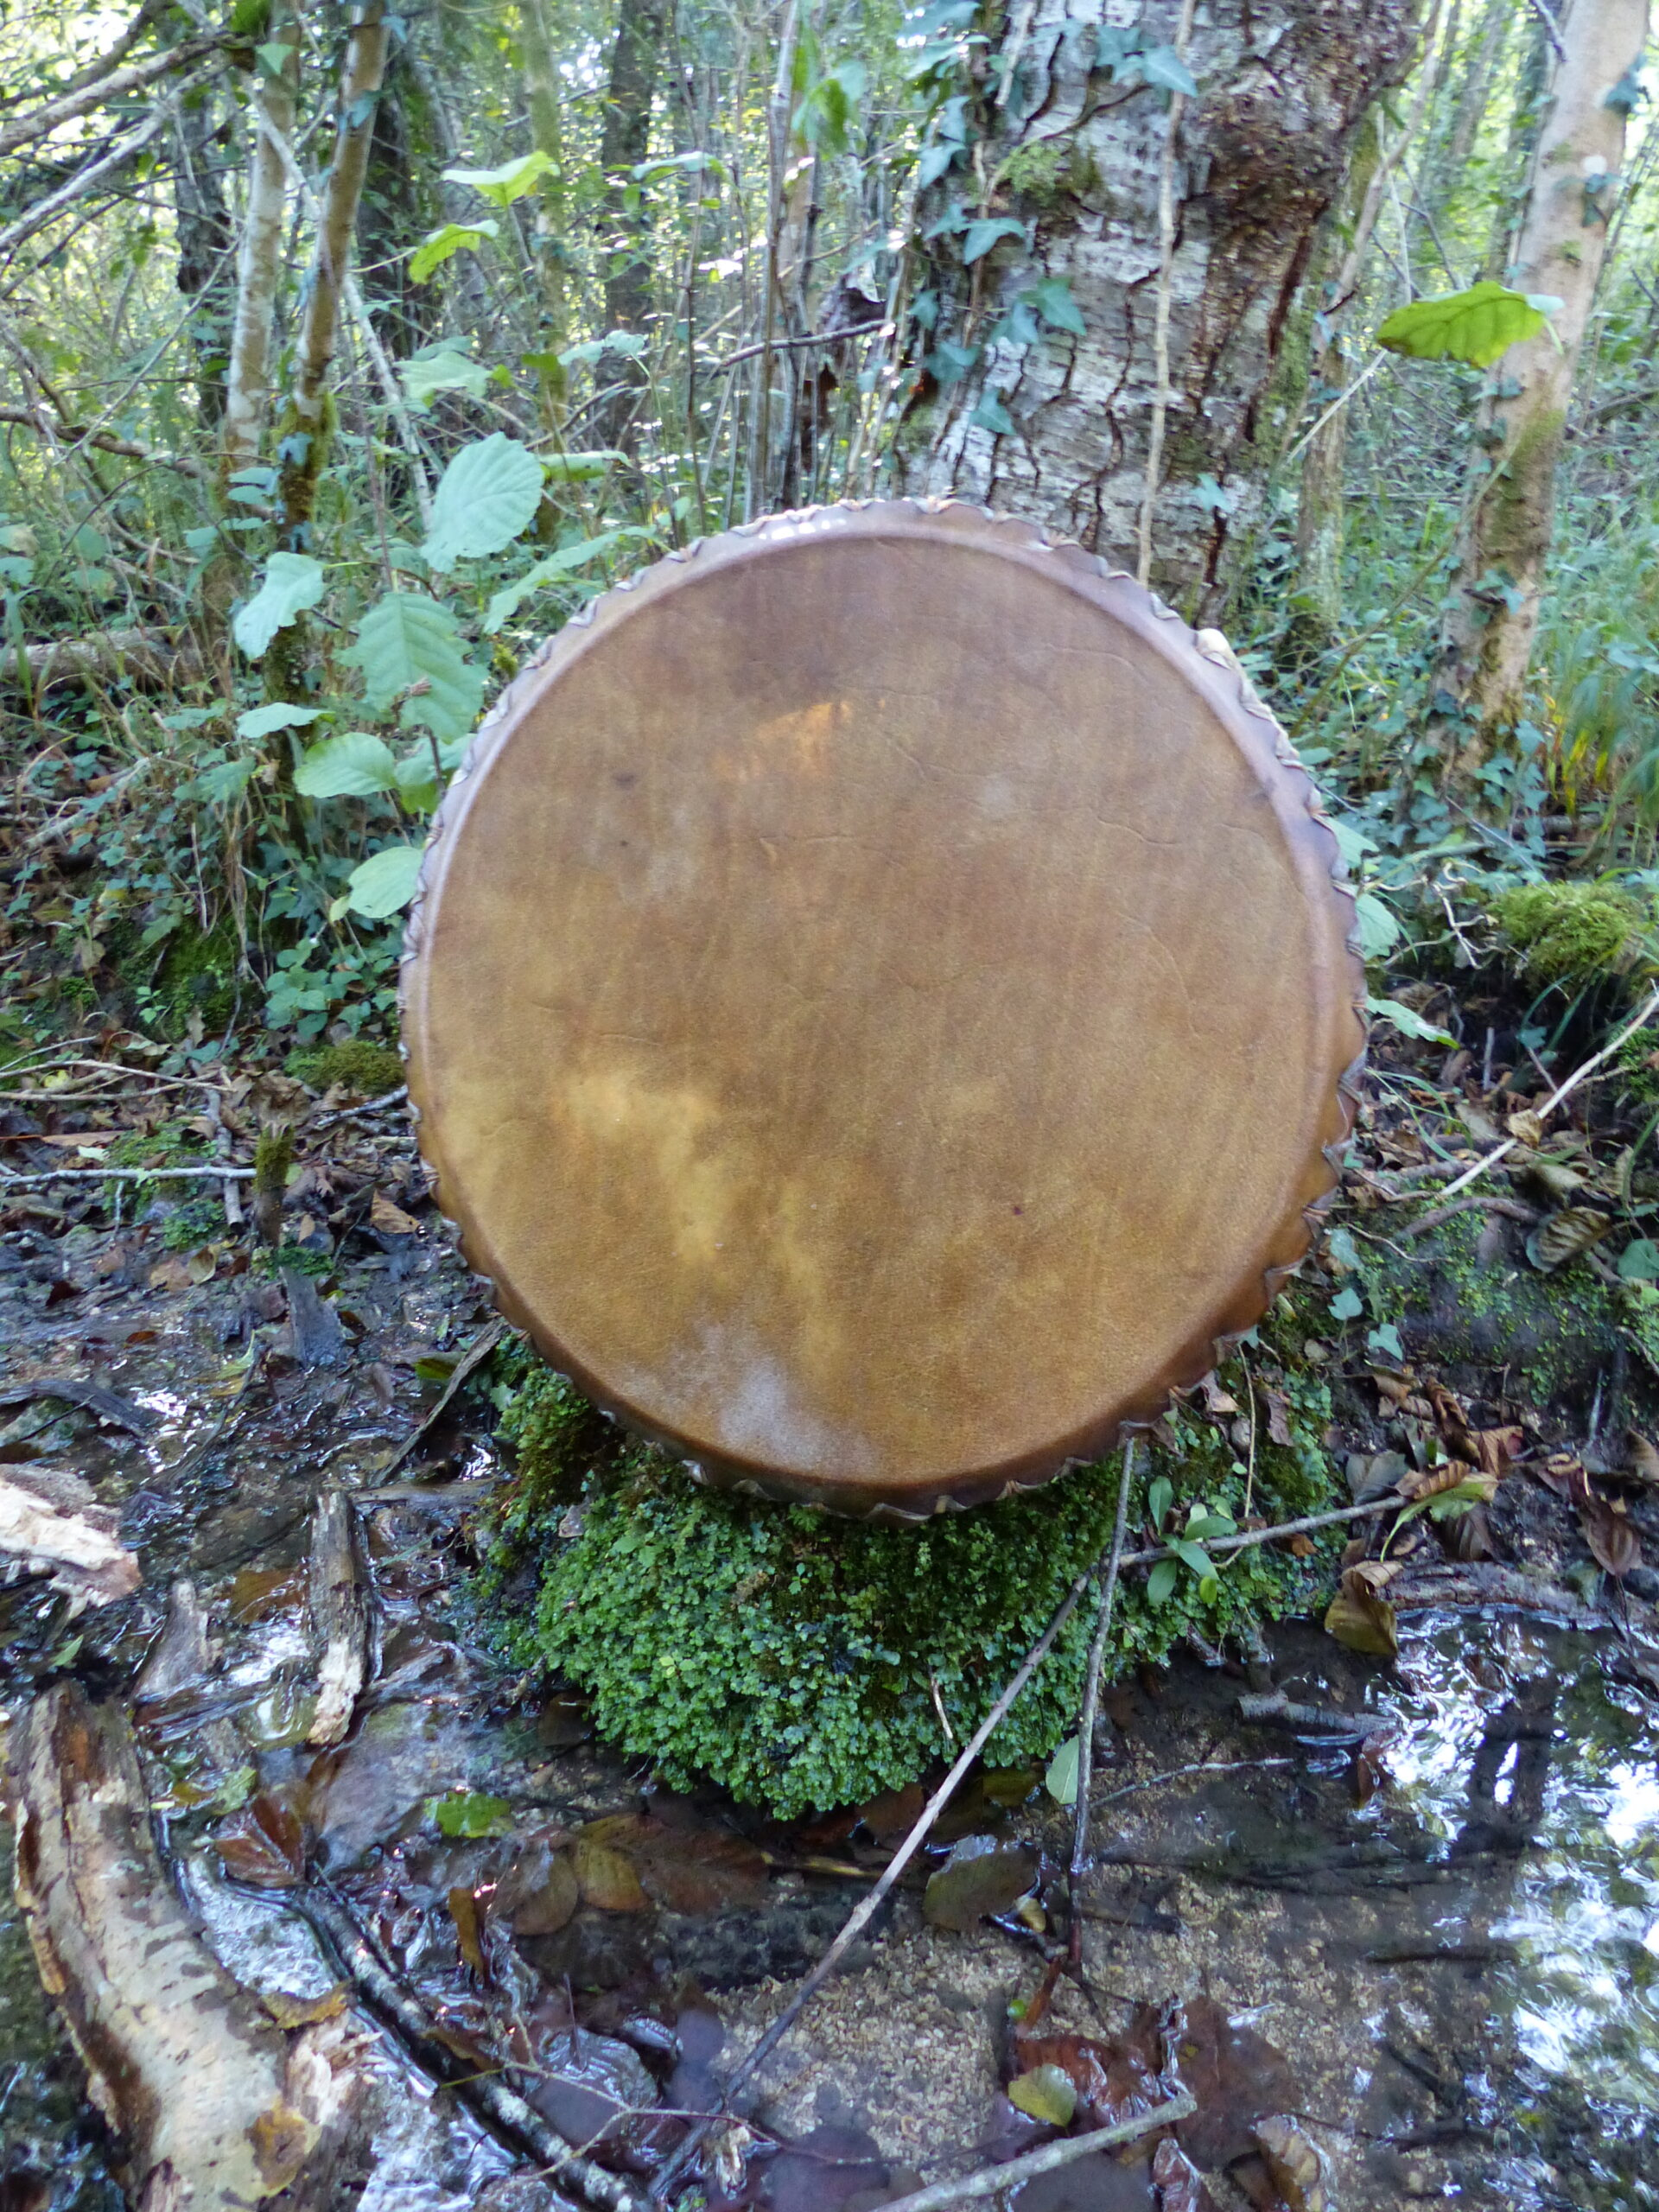 shamanic drum for journeying and meditation